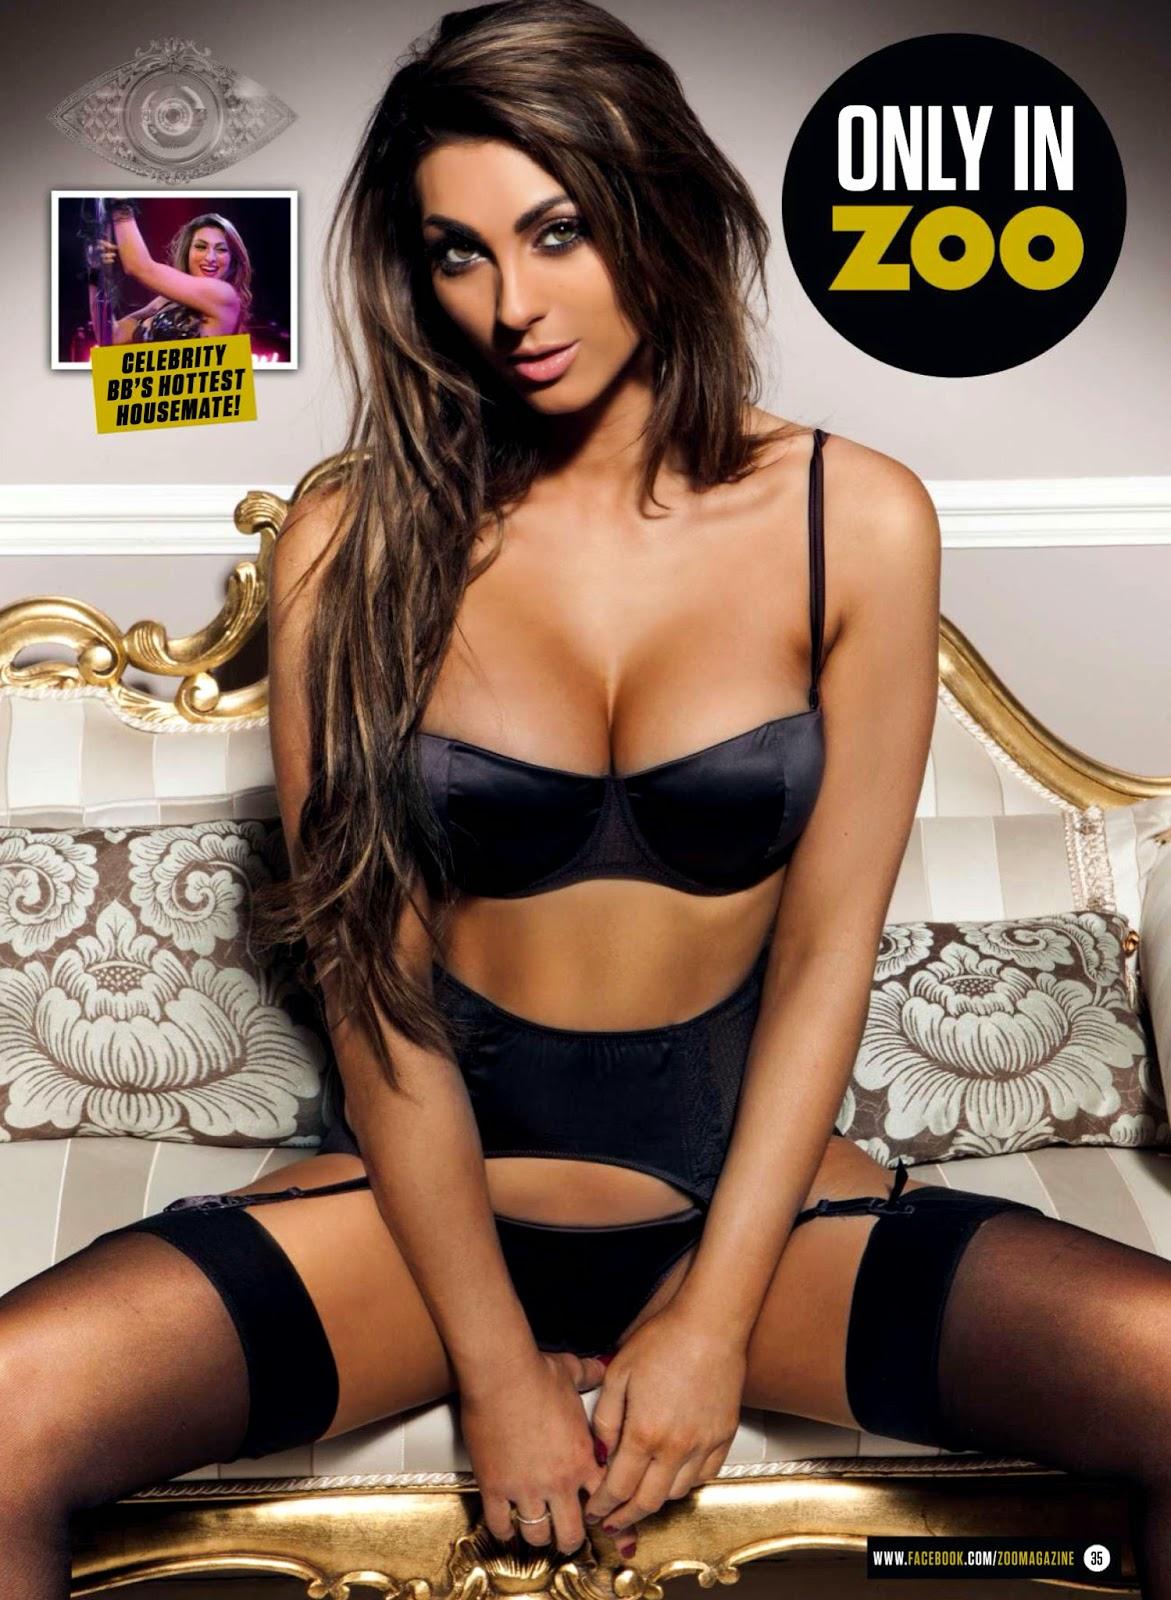 Luisa Zissman HQ Pictures Zoo UK Magazine Photoshoot February 2014